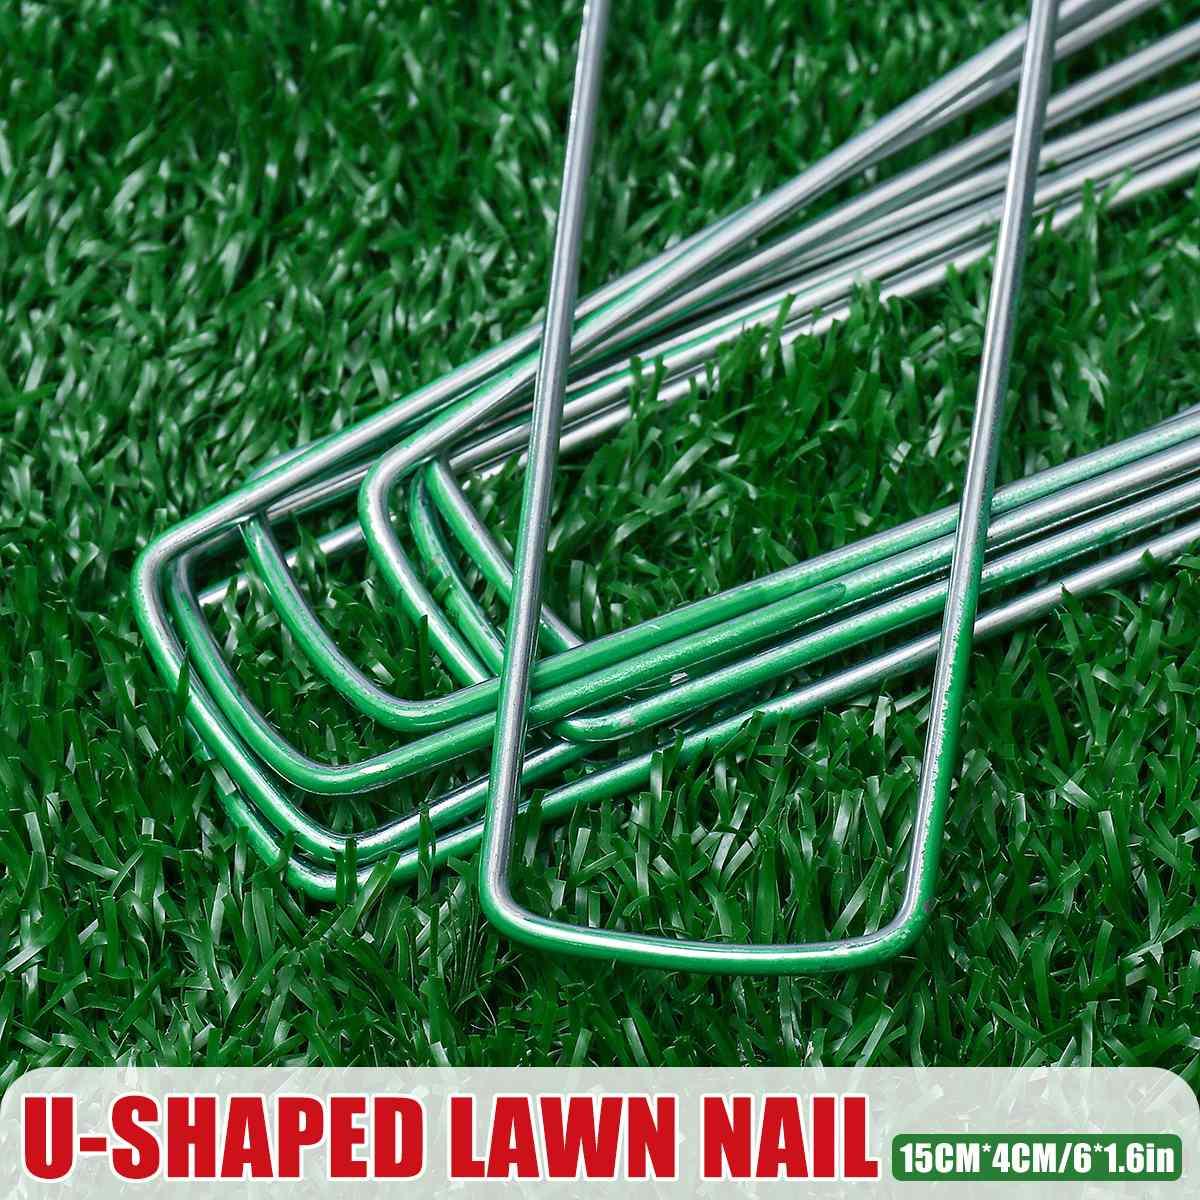 100Pcs/set Artificial Grass Turf U Pins Metal Galvanised Pegs Staple Weed Garden Hot-dip Galvanizing Gardening Accessories